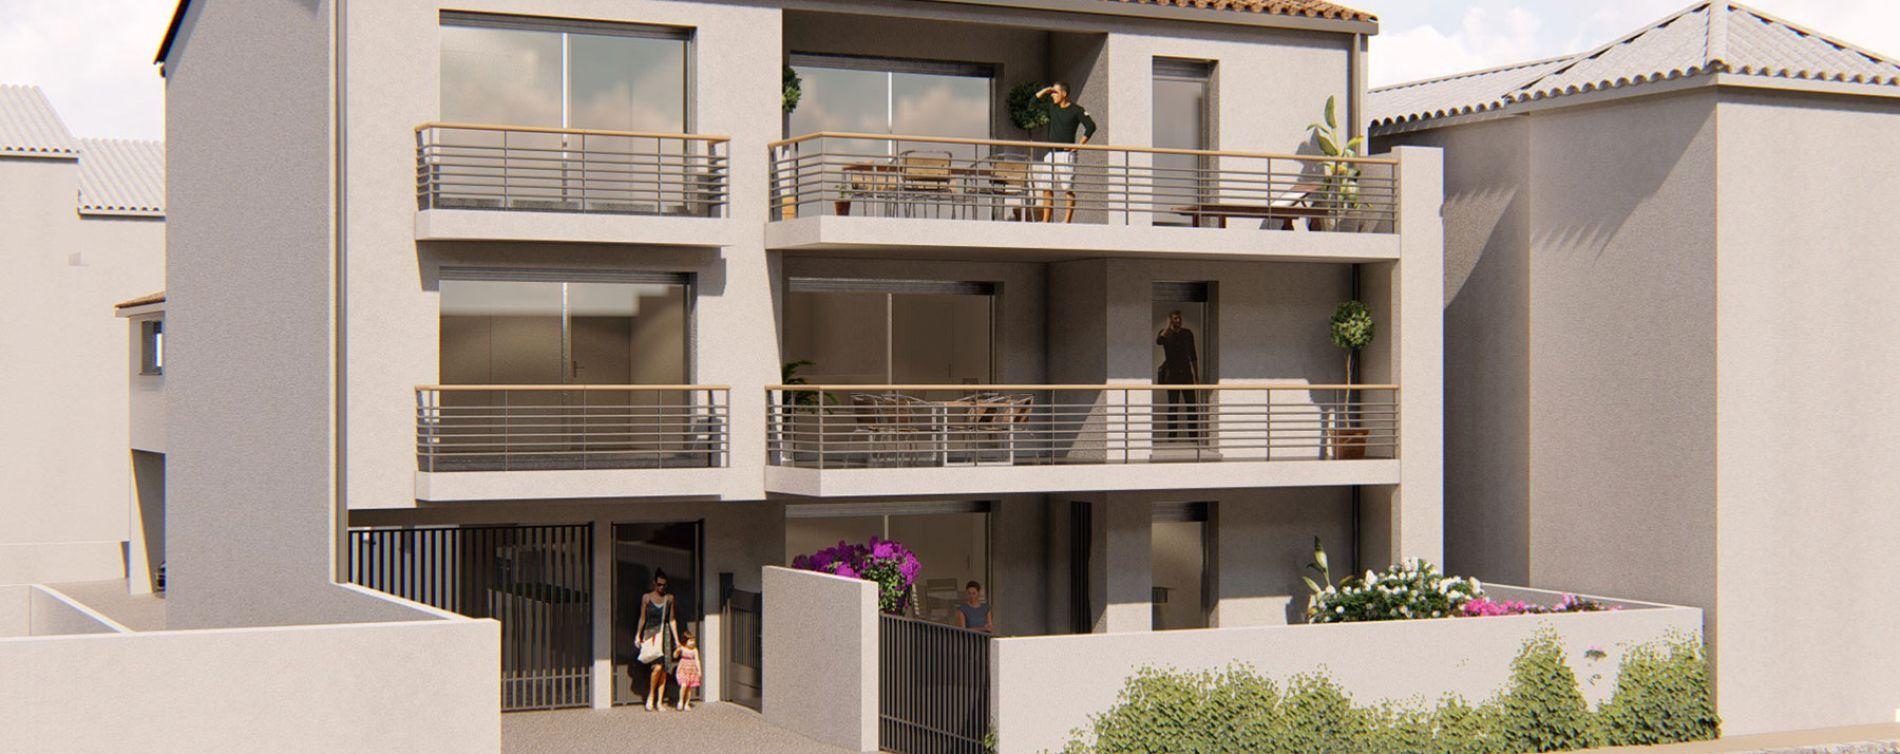 Résidence Le Grau d'Agde à Agde